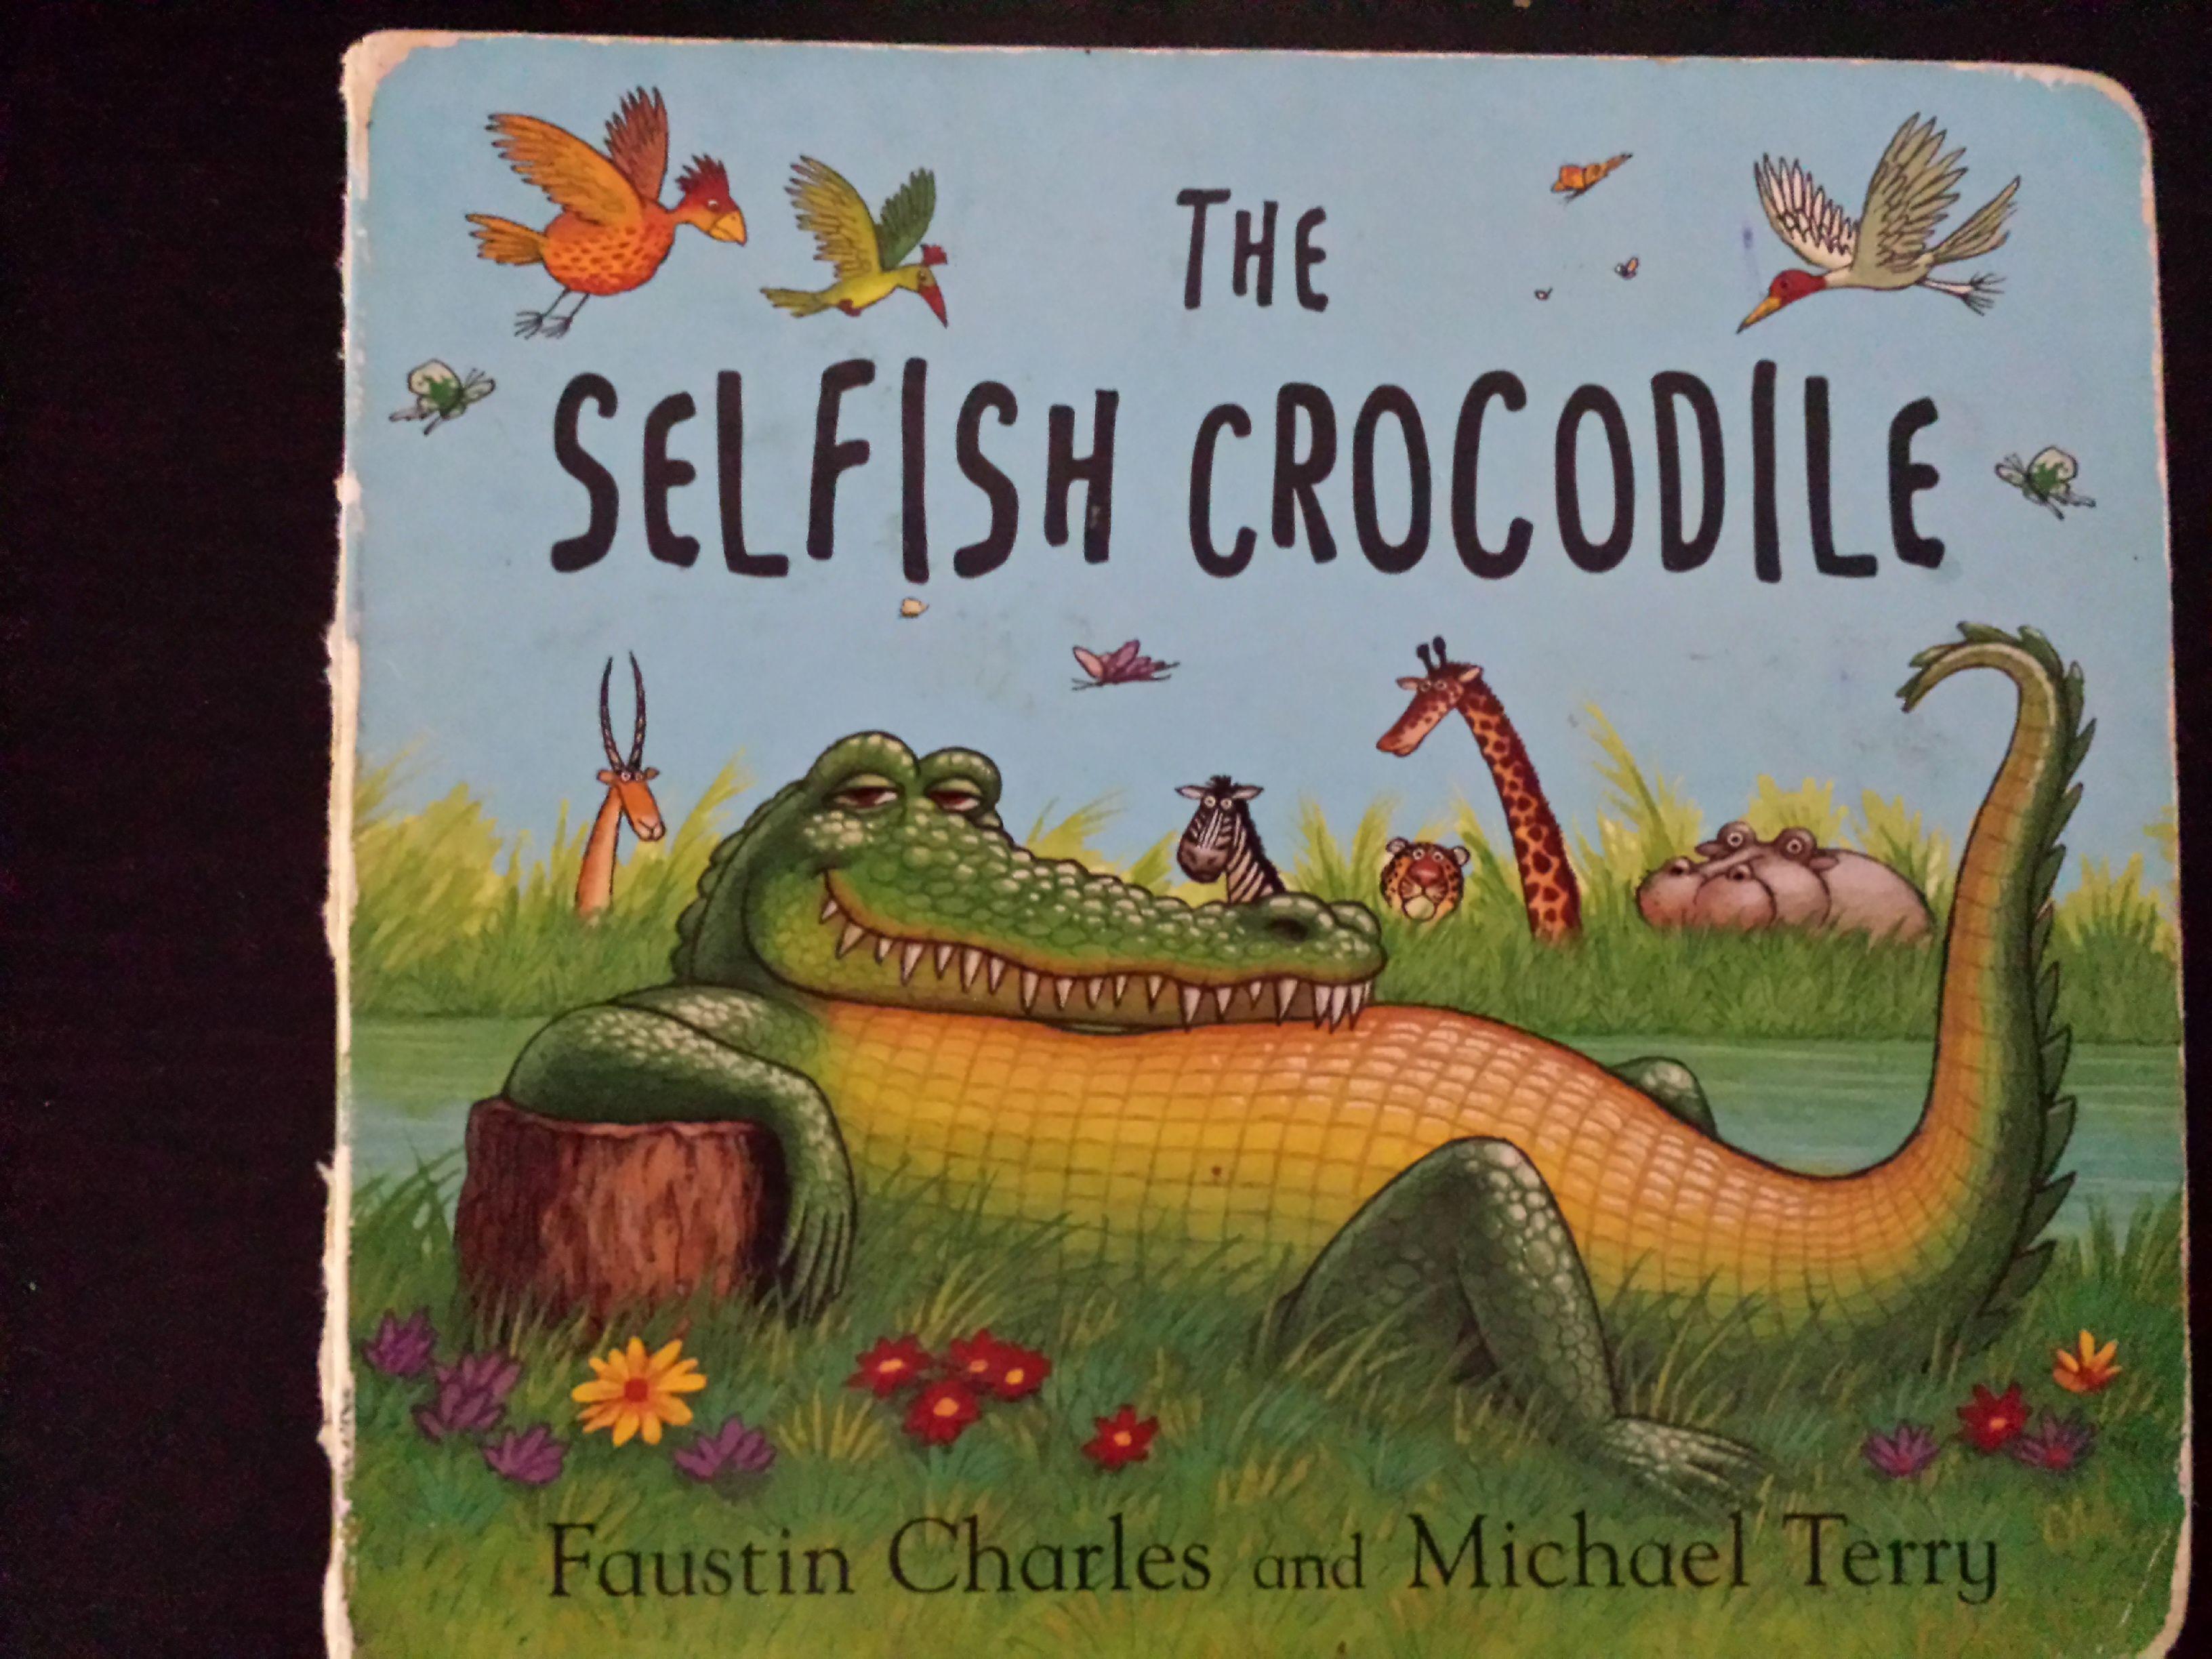 The Selfish Crocodile Di Faustin Charles E Michael Terry E